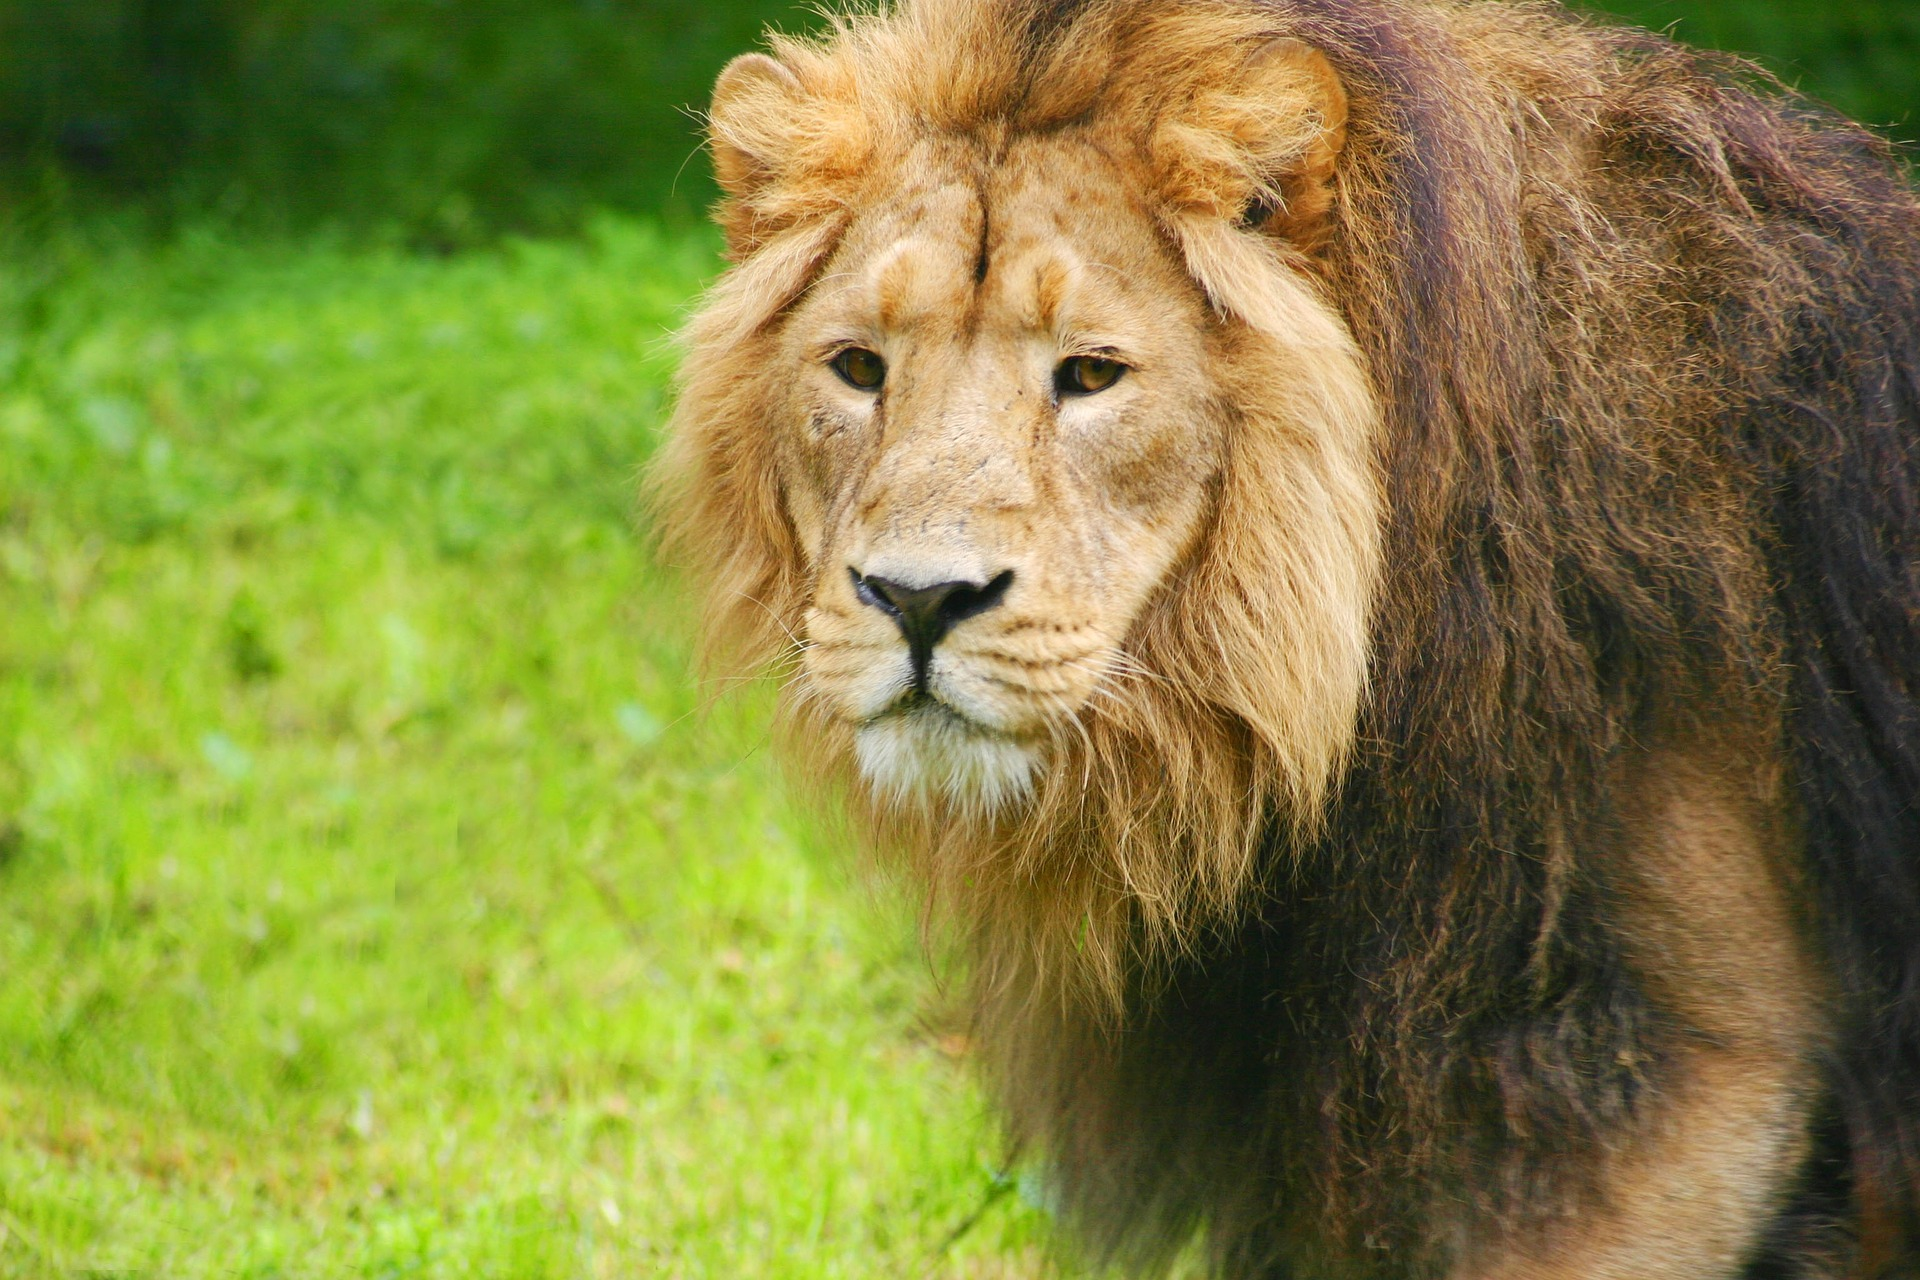 Gambar Singa Full HD